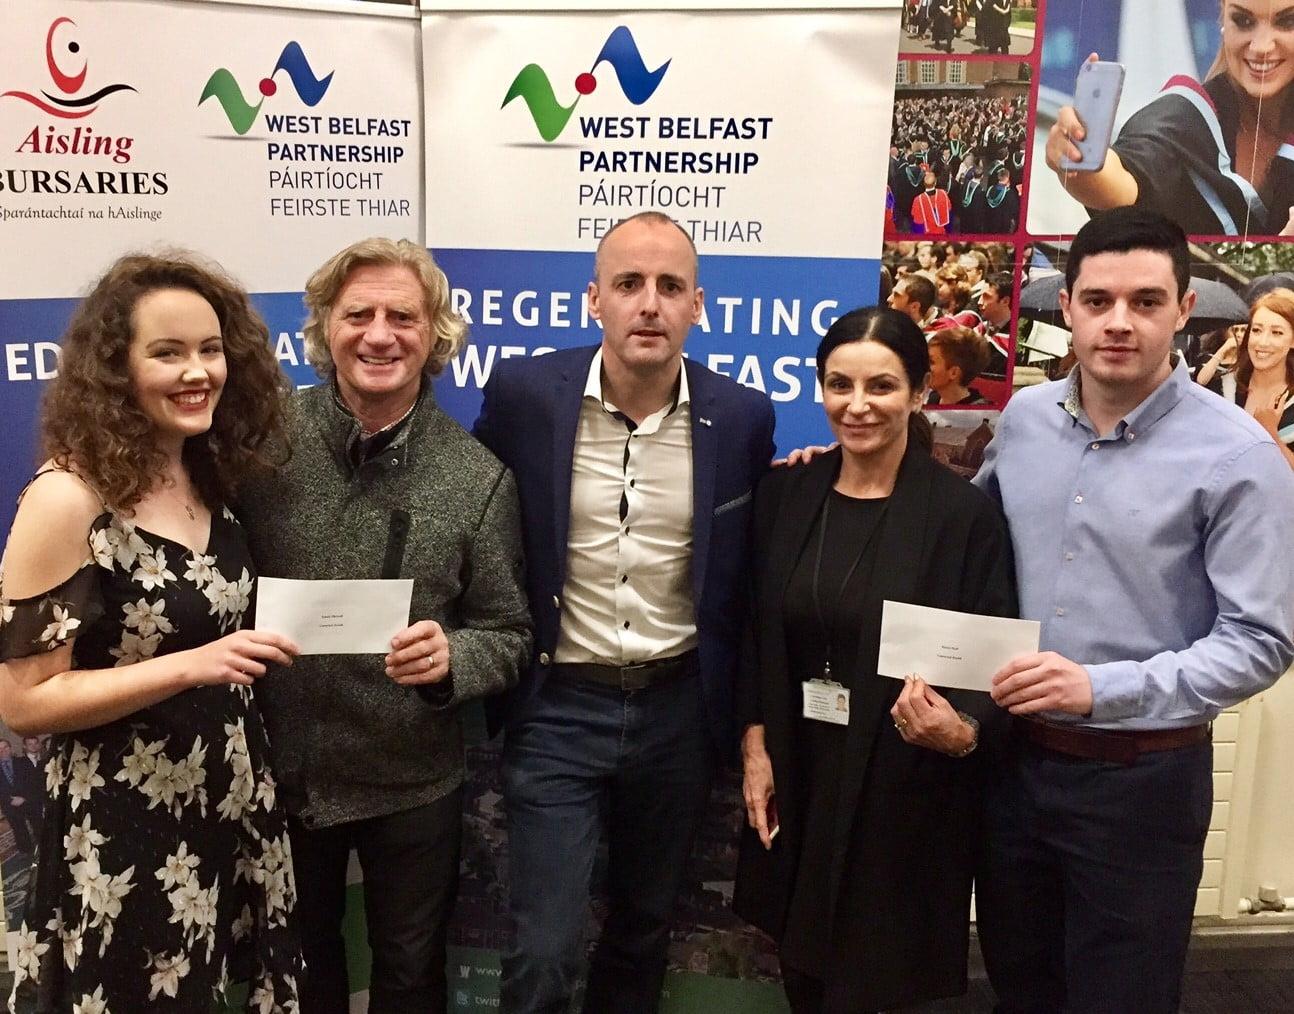 Aisling Bursary Awards 2017 Connected Health proud sponsors